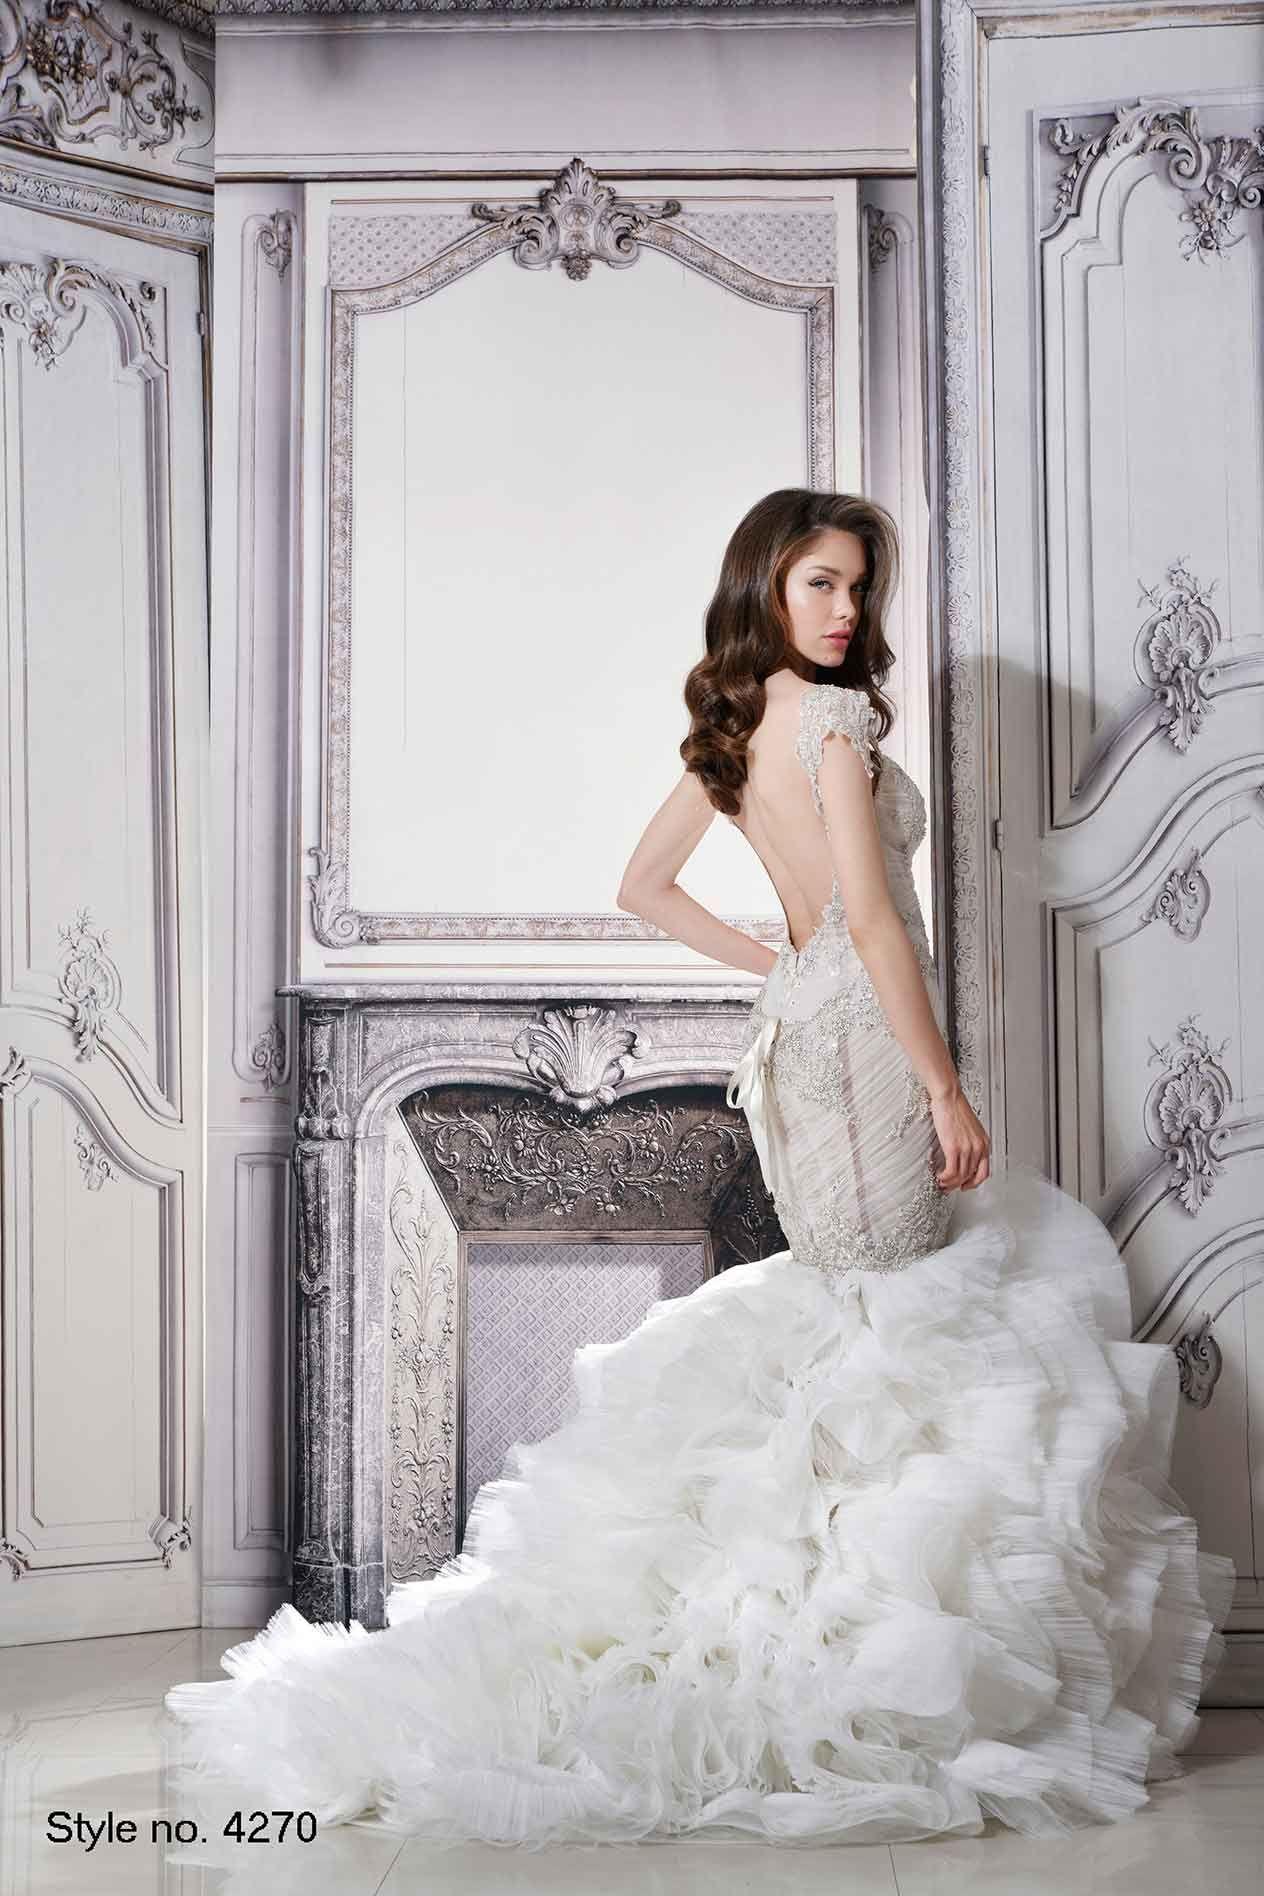 Pnina tornai style back pninatornai wedding dress ideas